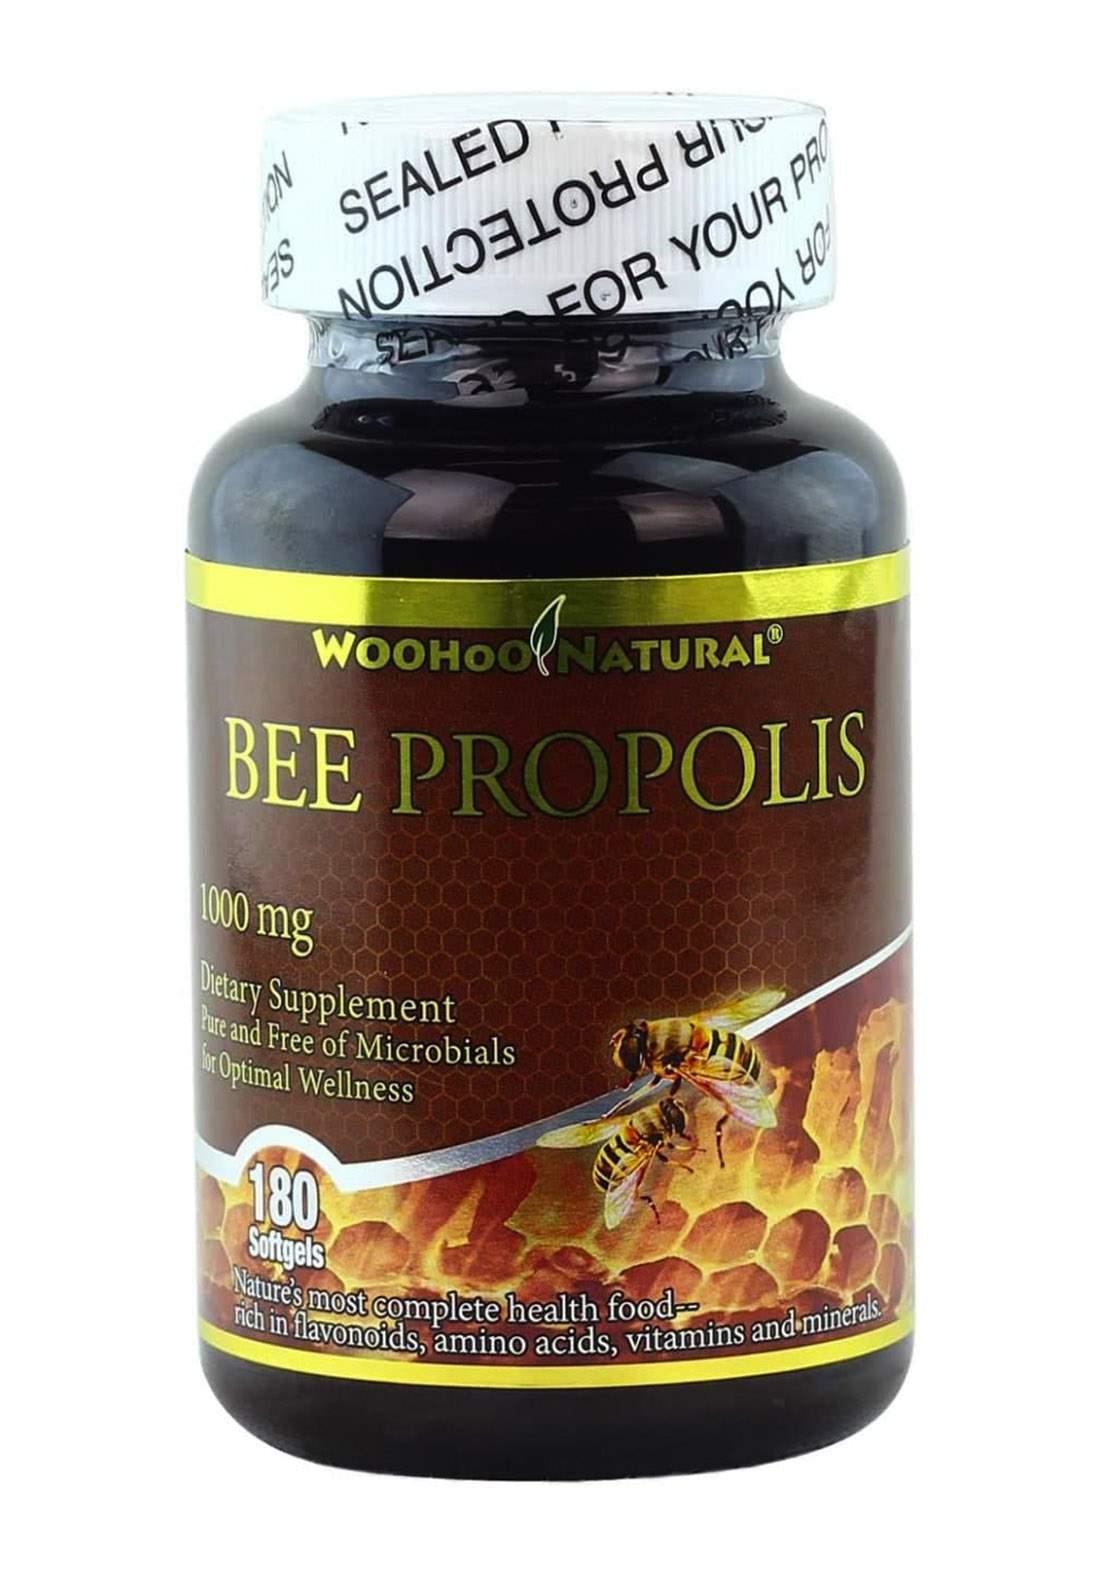 Woohoo Natural Bee Propolis 500mg  180 Capsules فيتامينات